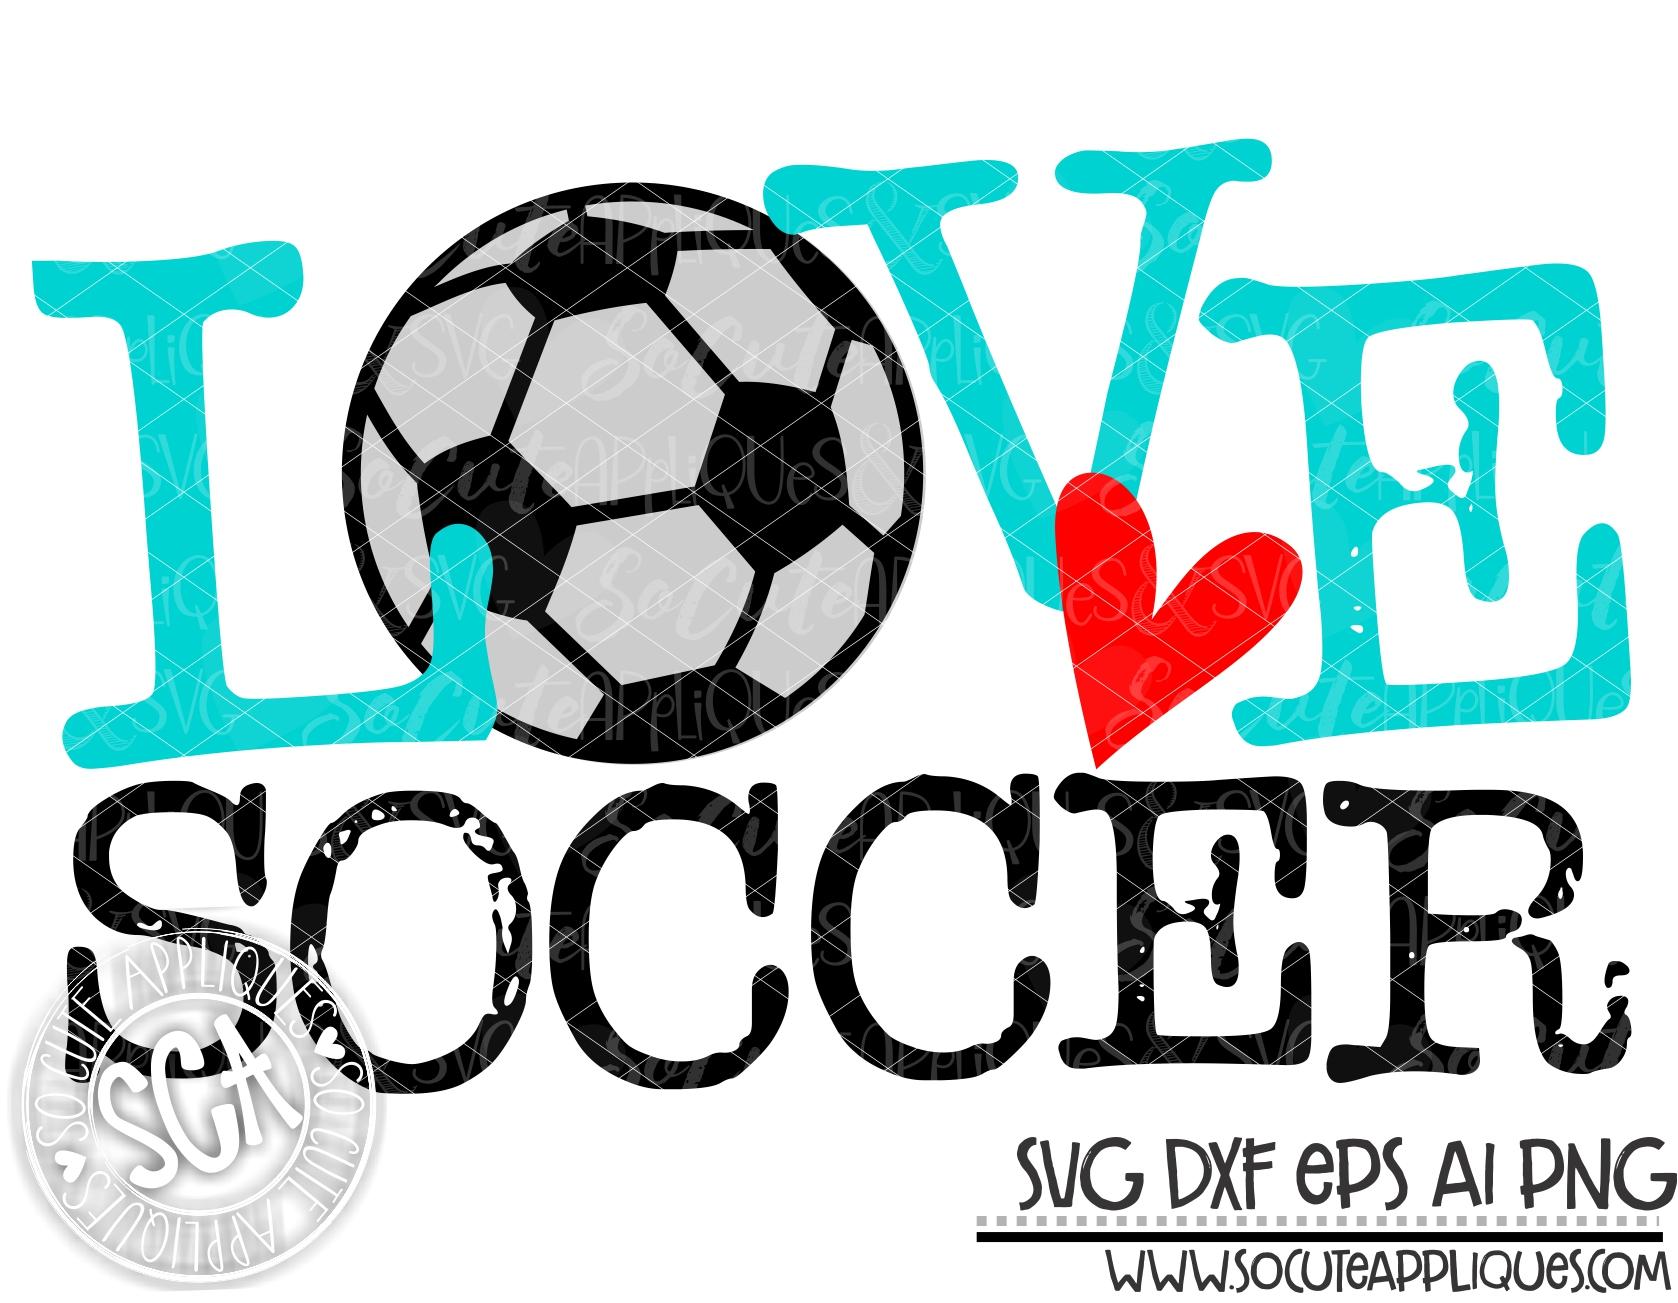 Download love type soccer 19 svg sca — socuteappliques.net